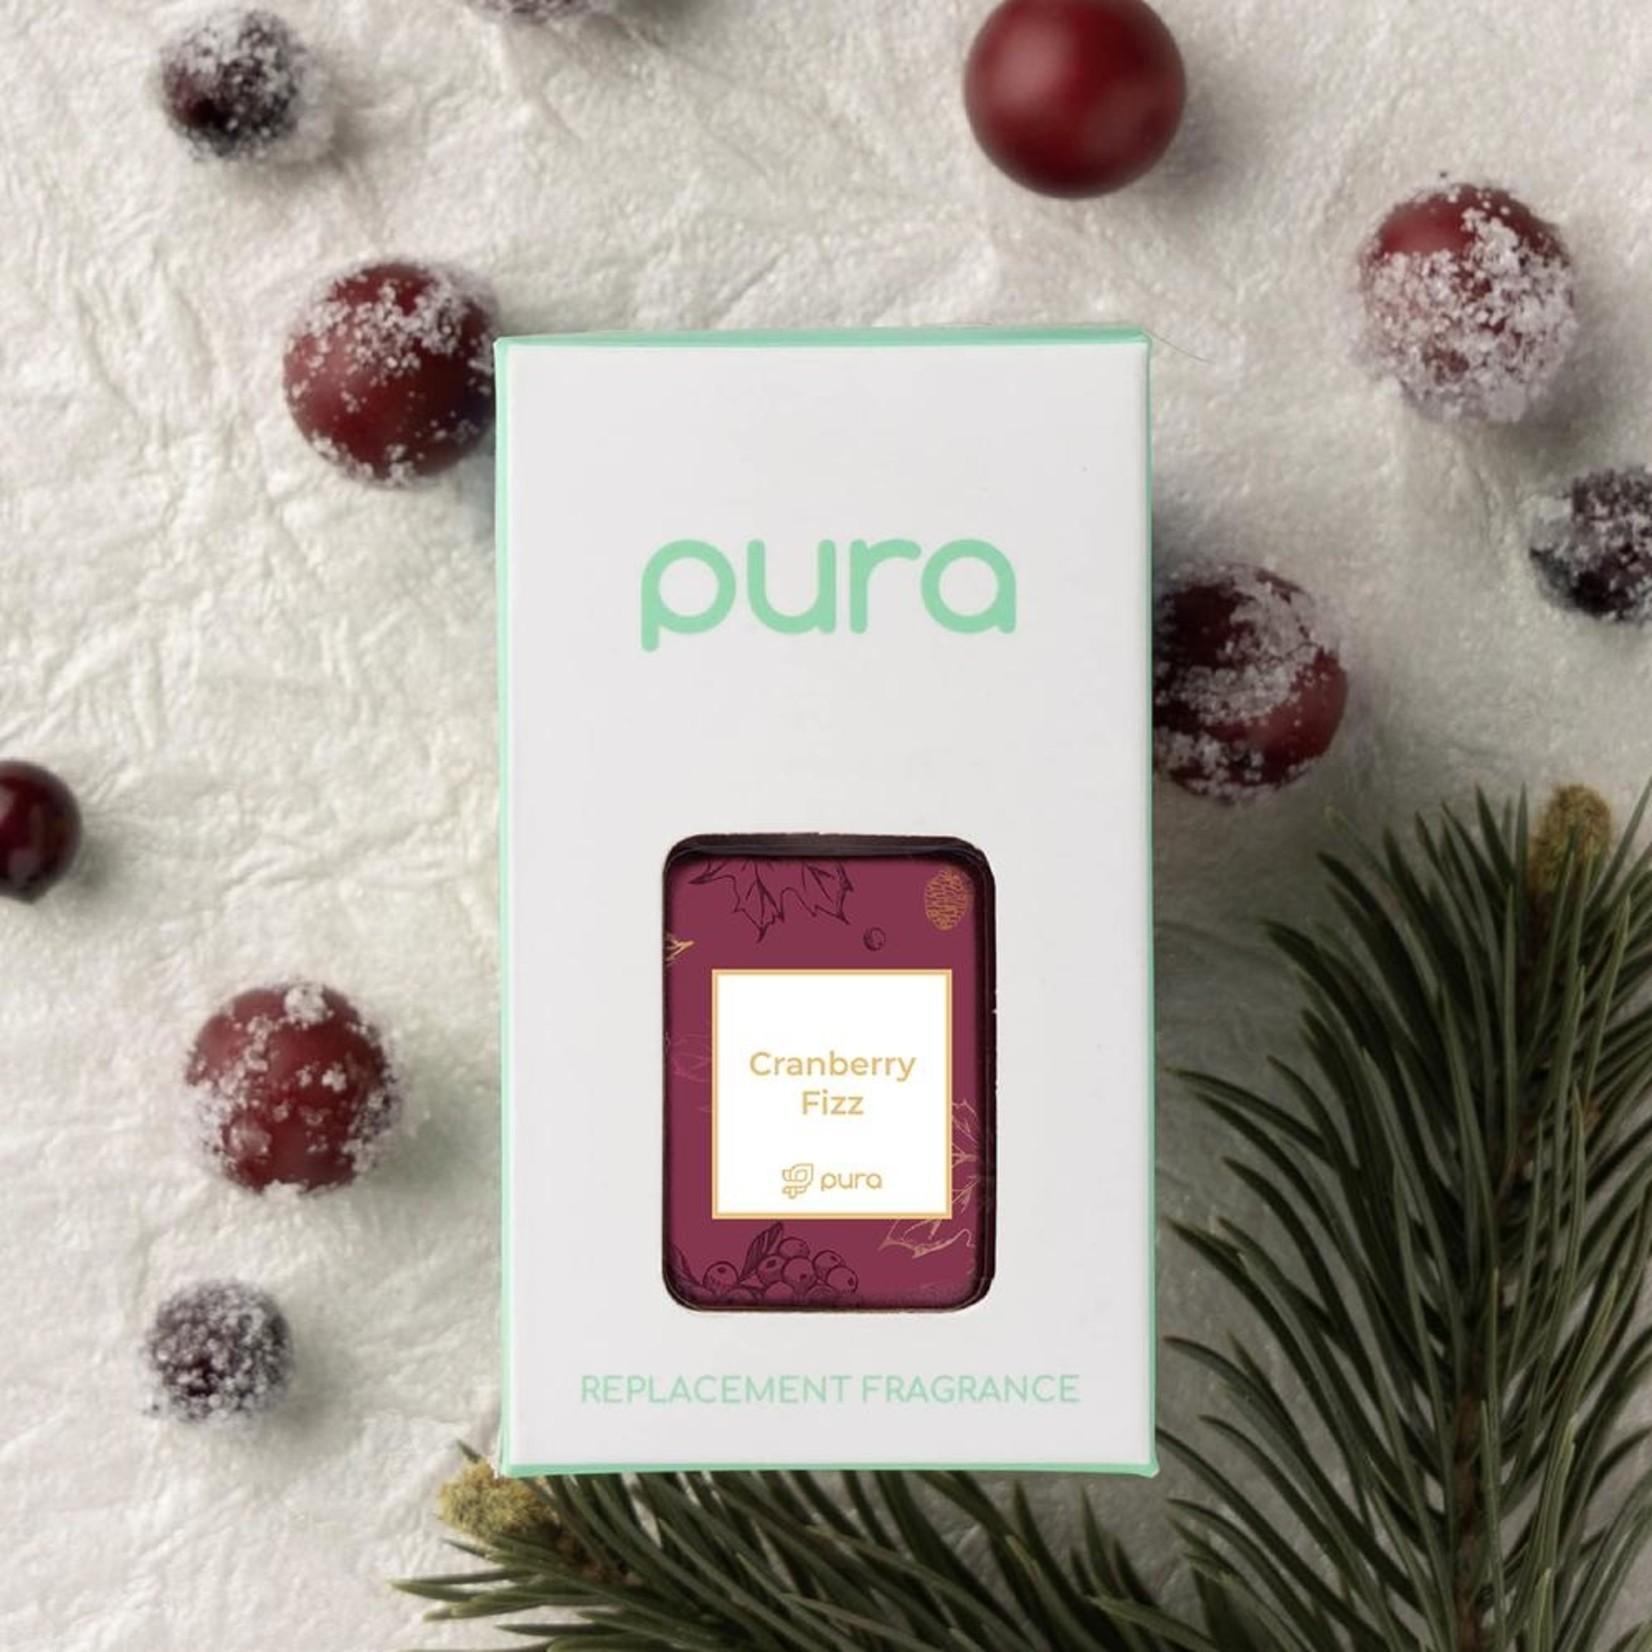 Pura Cranberry Fizz Pura Fragrance